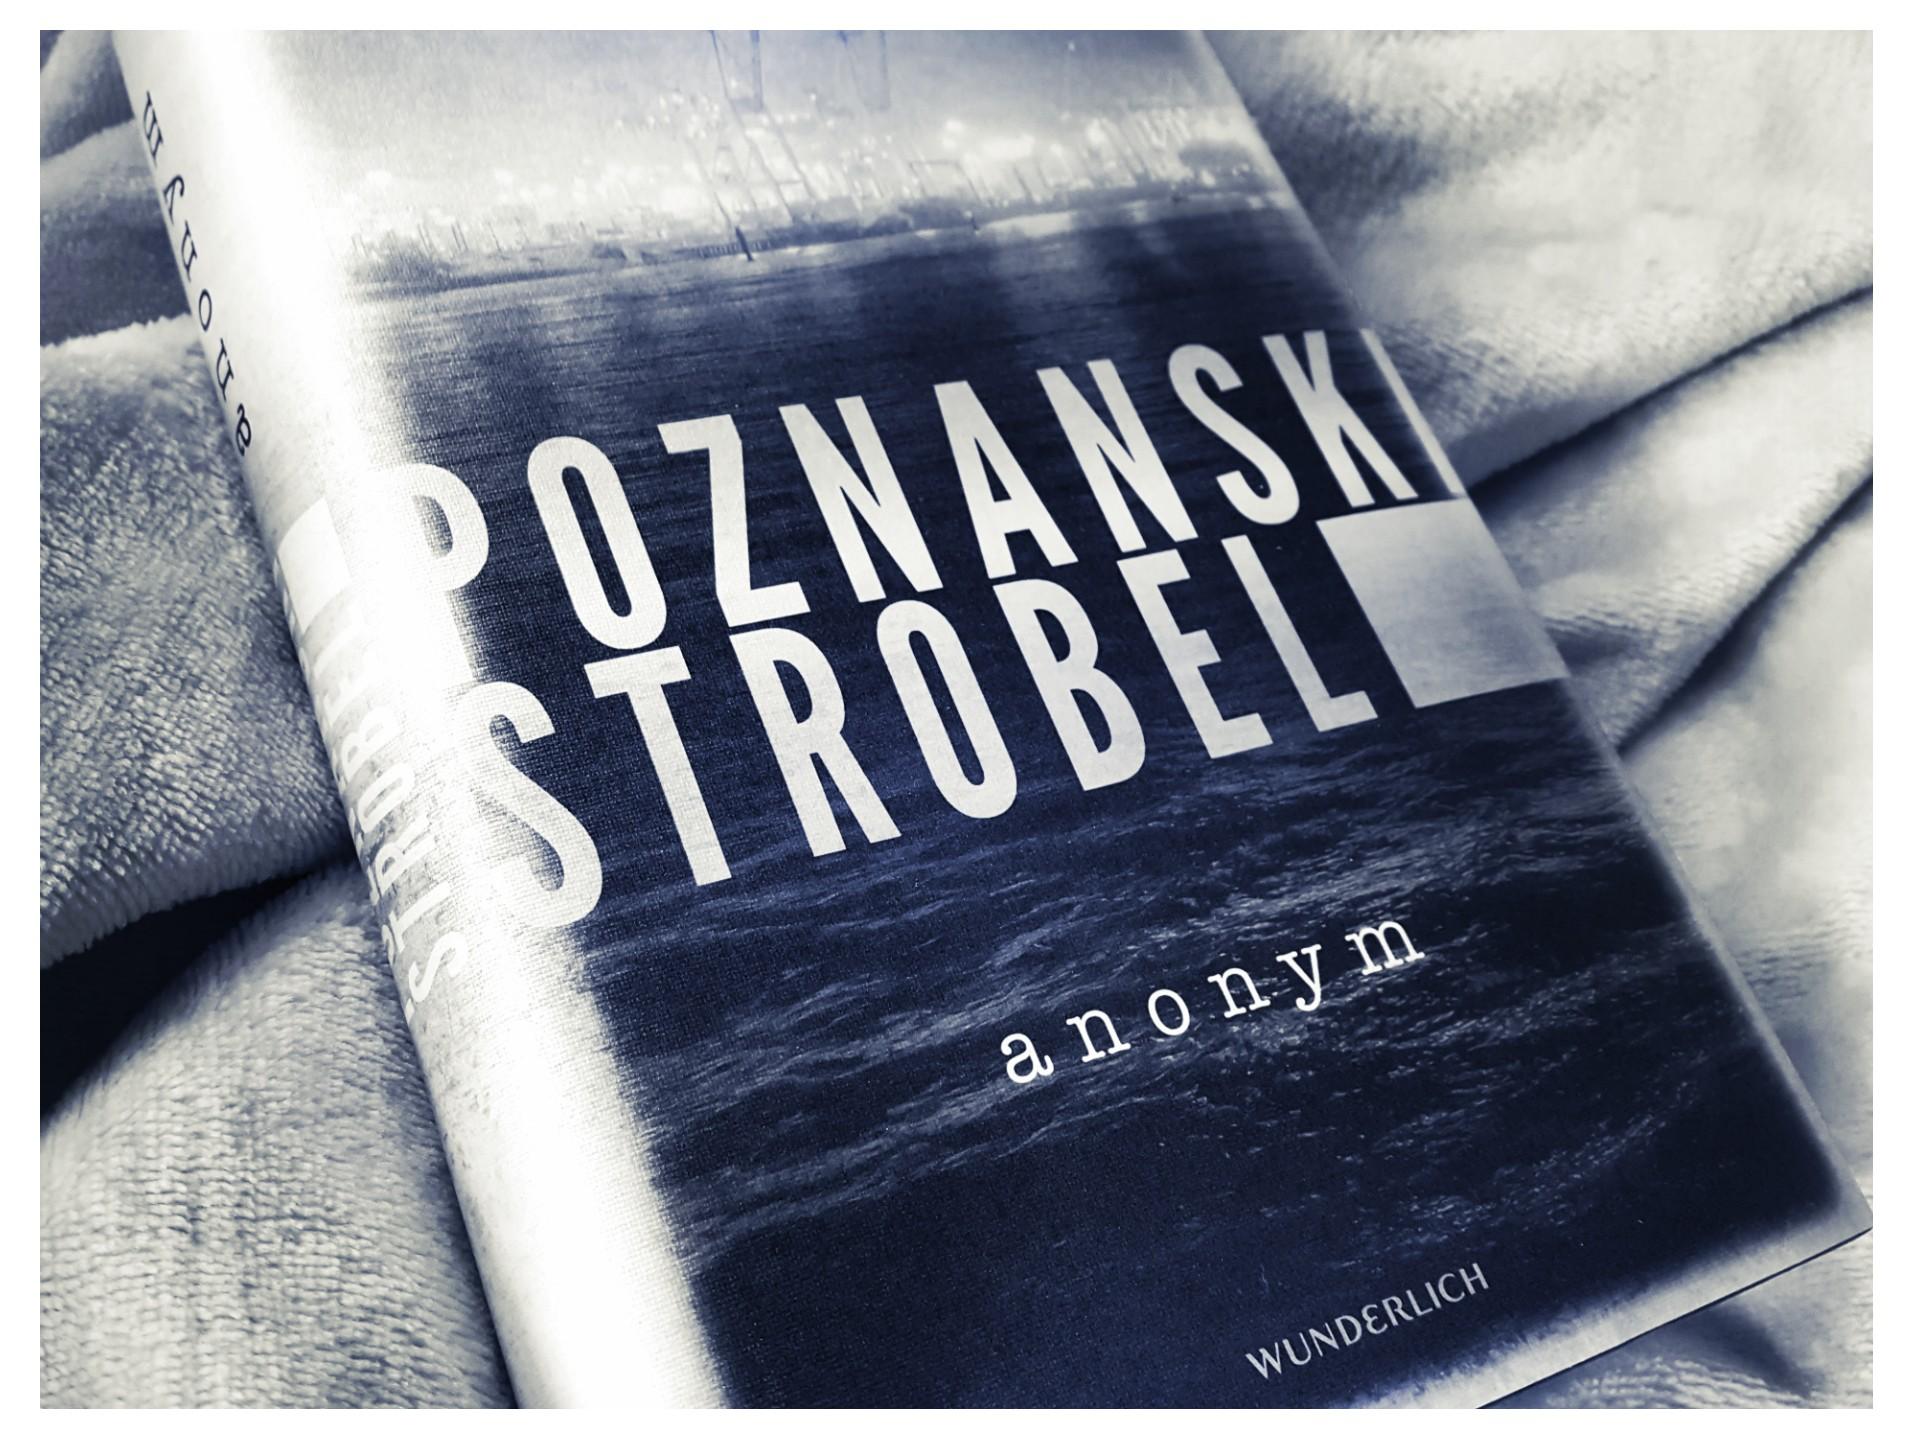 [Rezension] Ursula Poznanski/Arno Strobel – Anonym